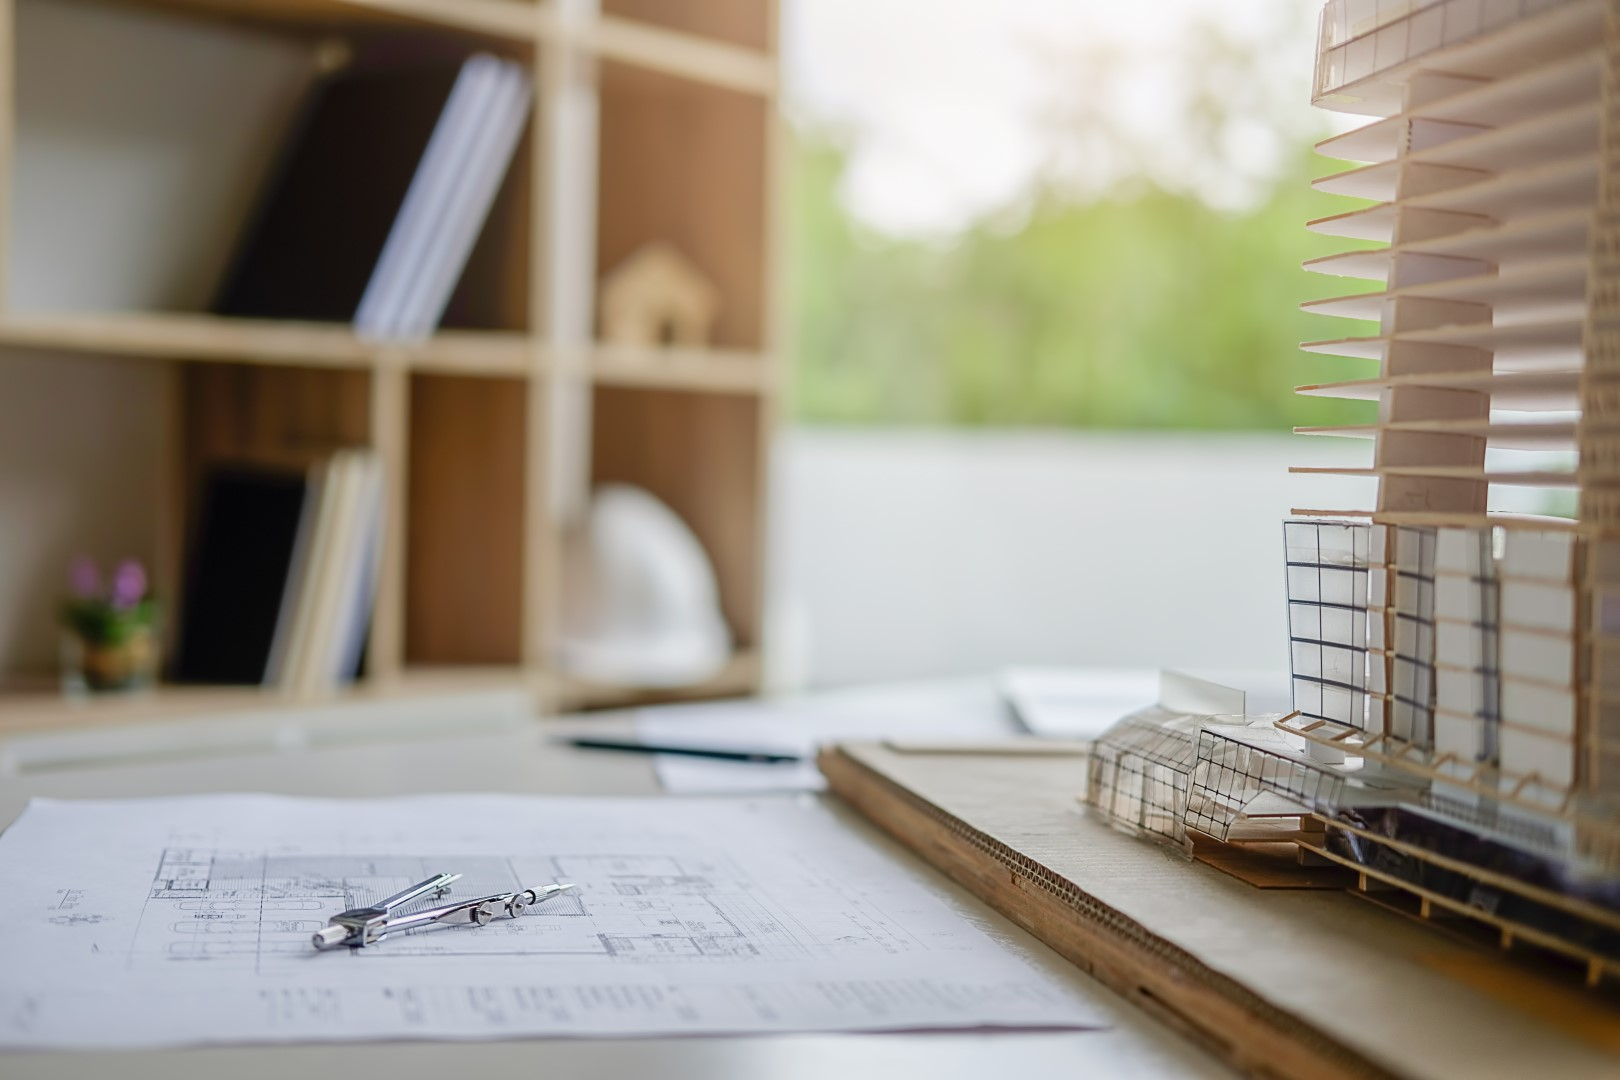 When Will Zeckendorf's $70 Million Penthouse Find A Buyer?